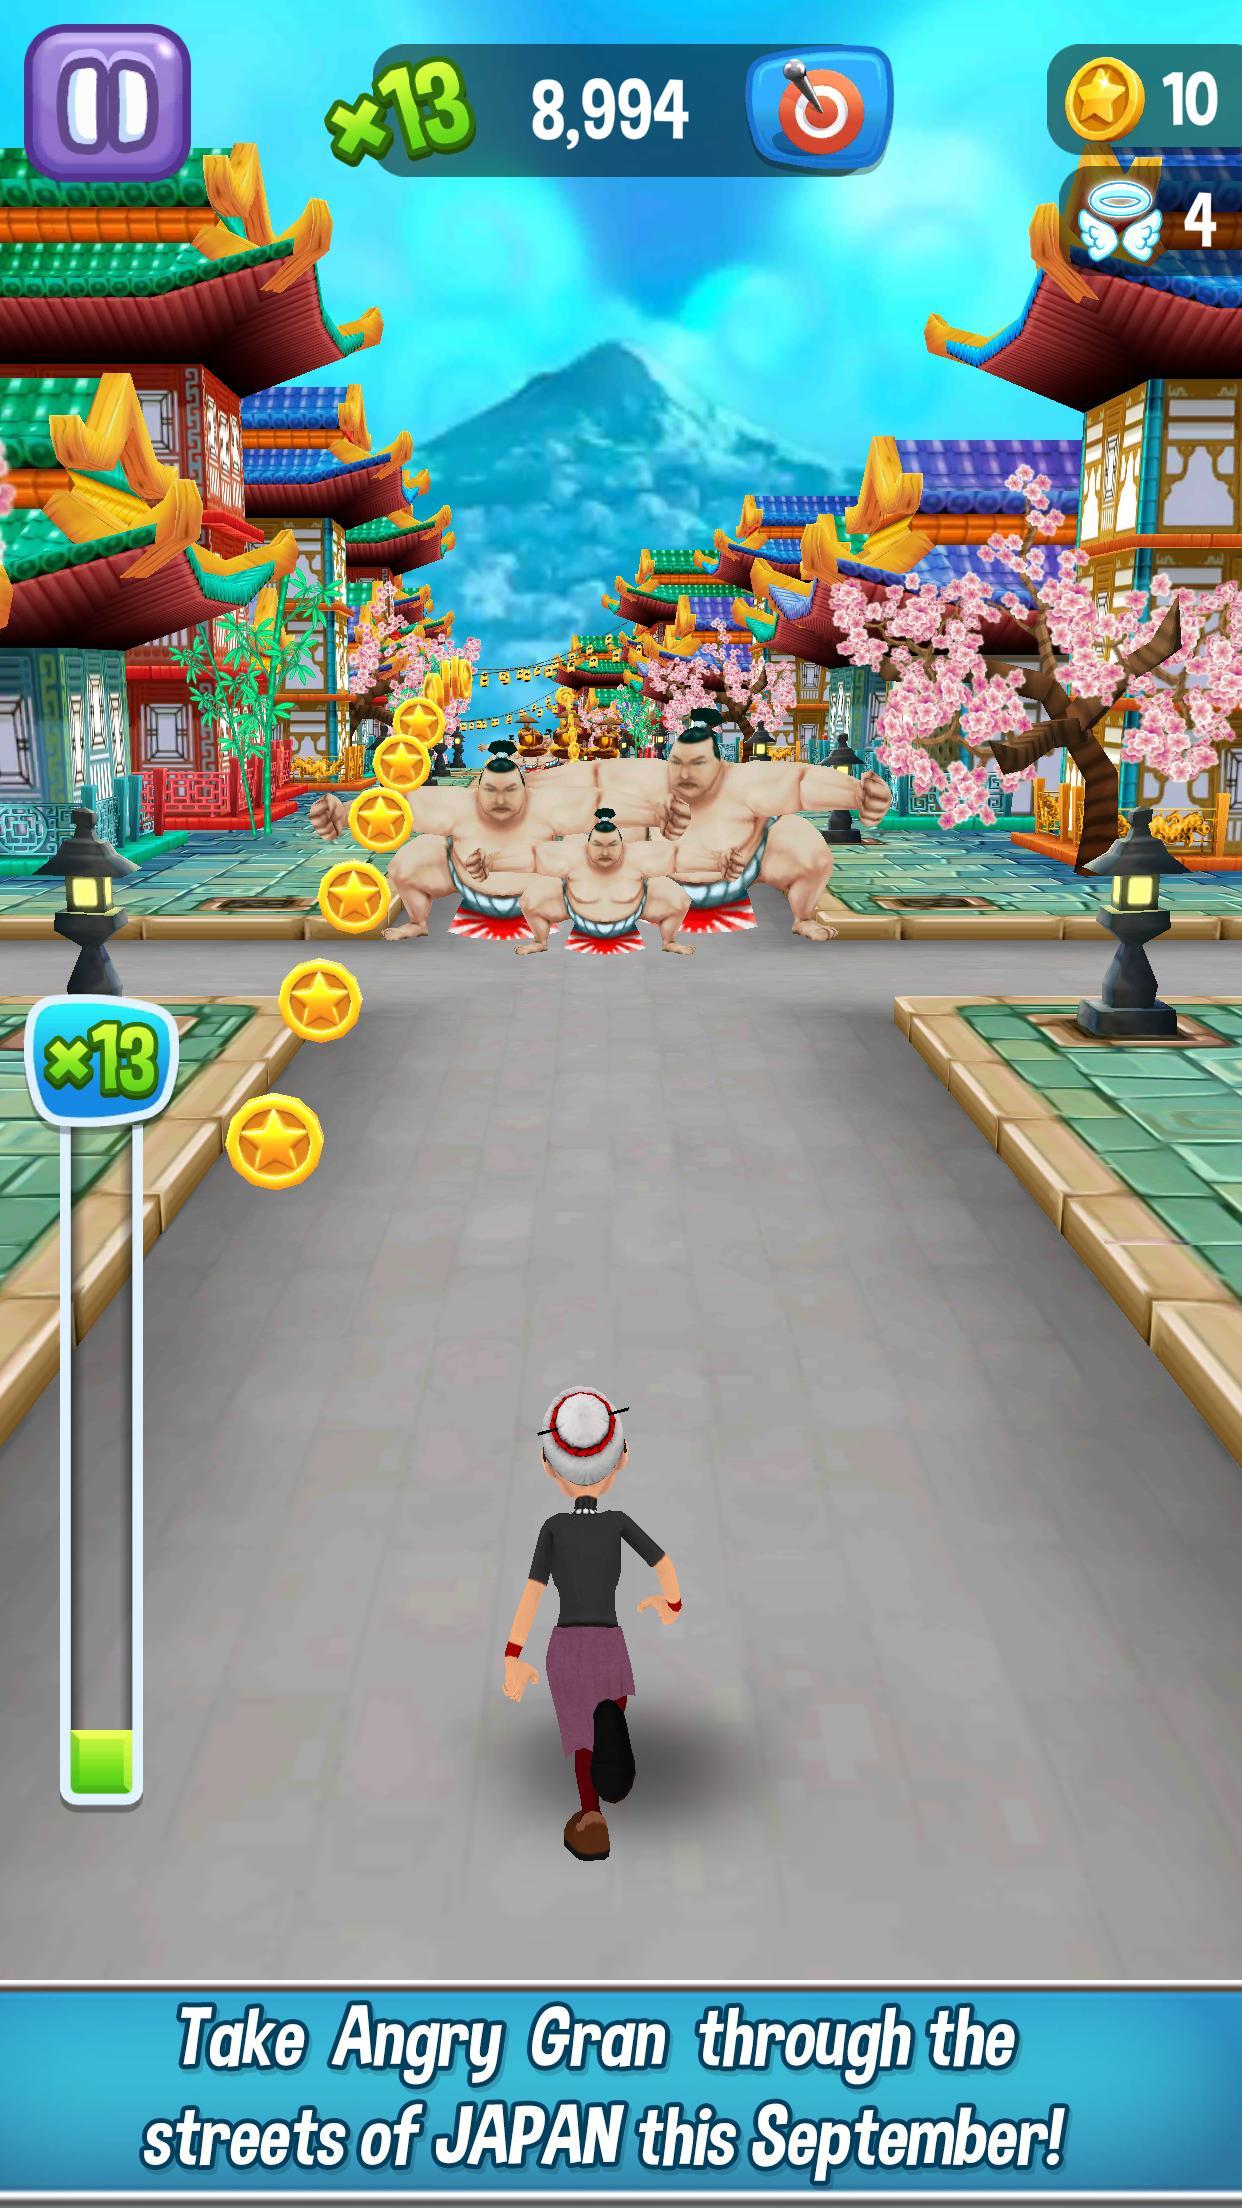 Angry Gran Run Running Game 2.12.1 Screenshot 2